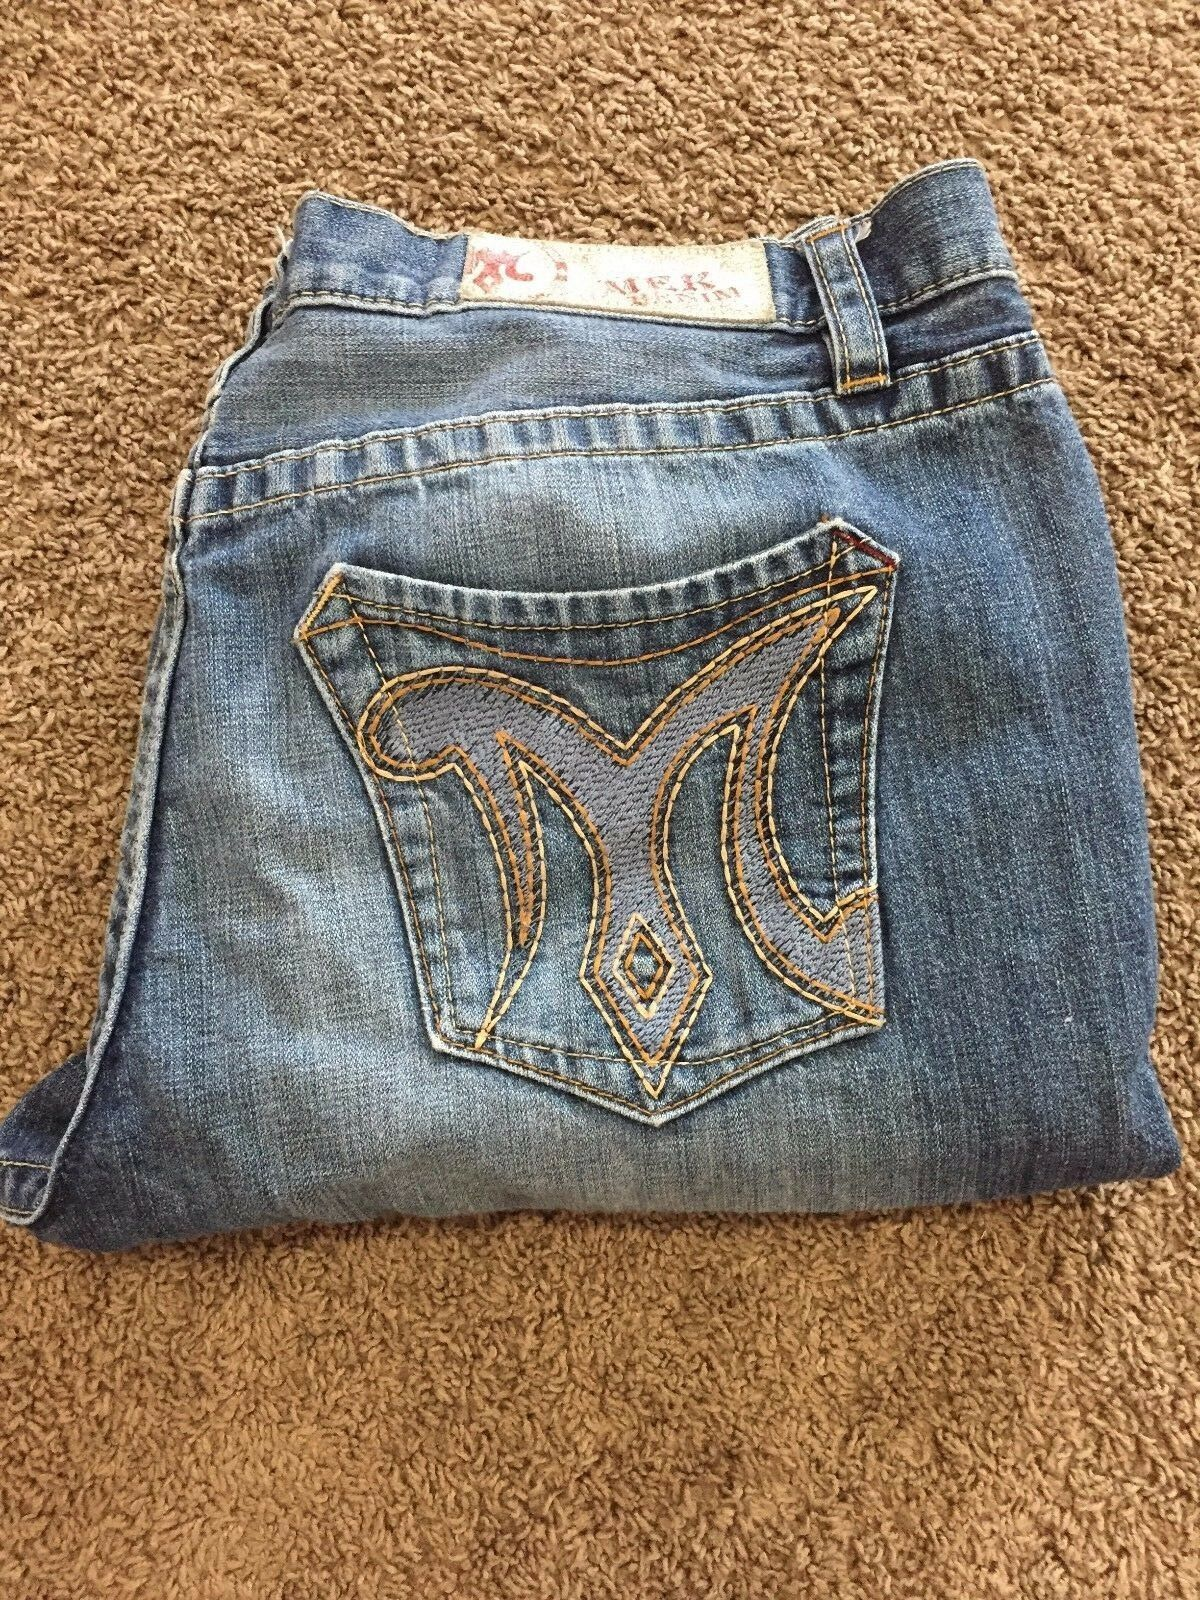 MEK Mens Size 40 x 34 Straight Jeans Pants ButtonFly